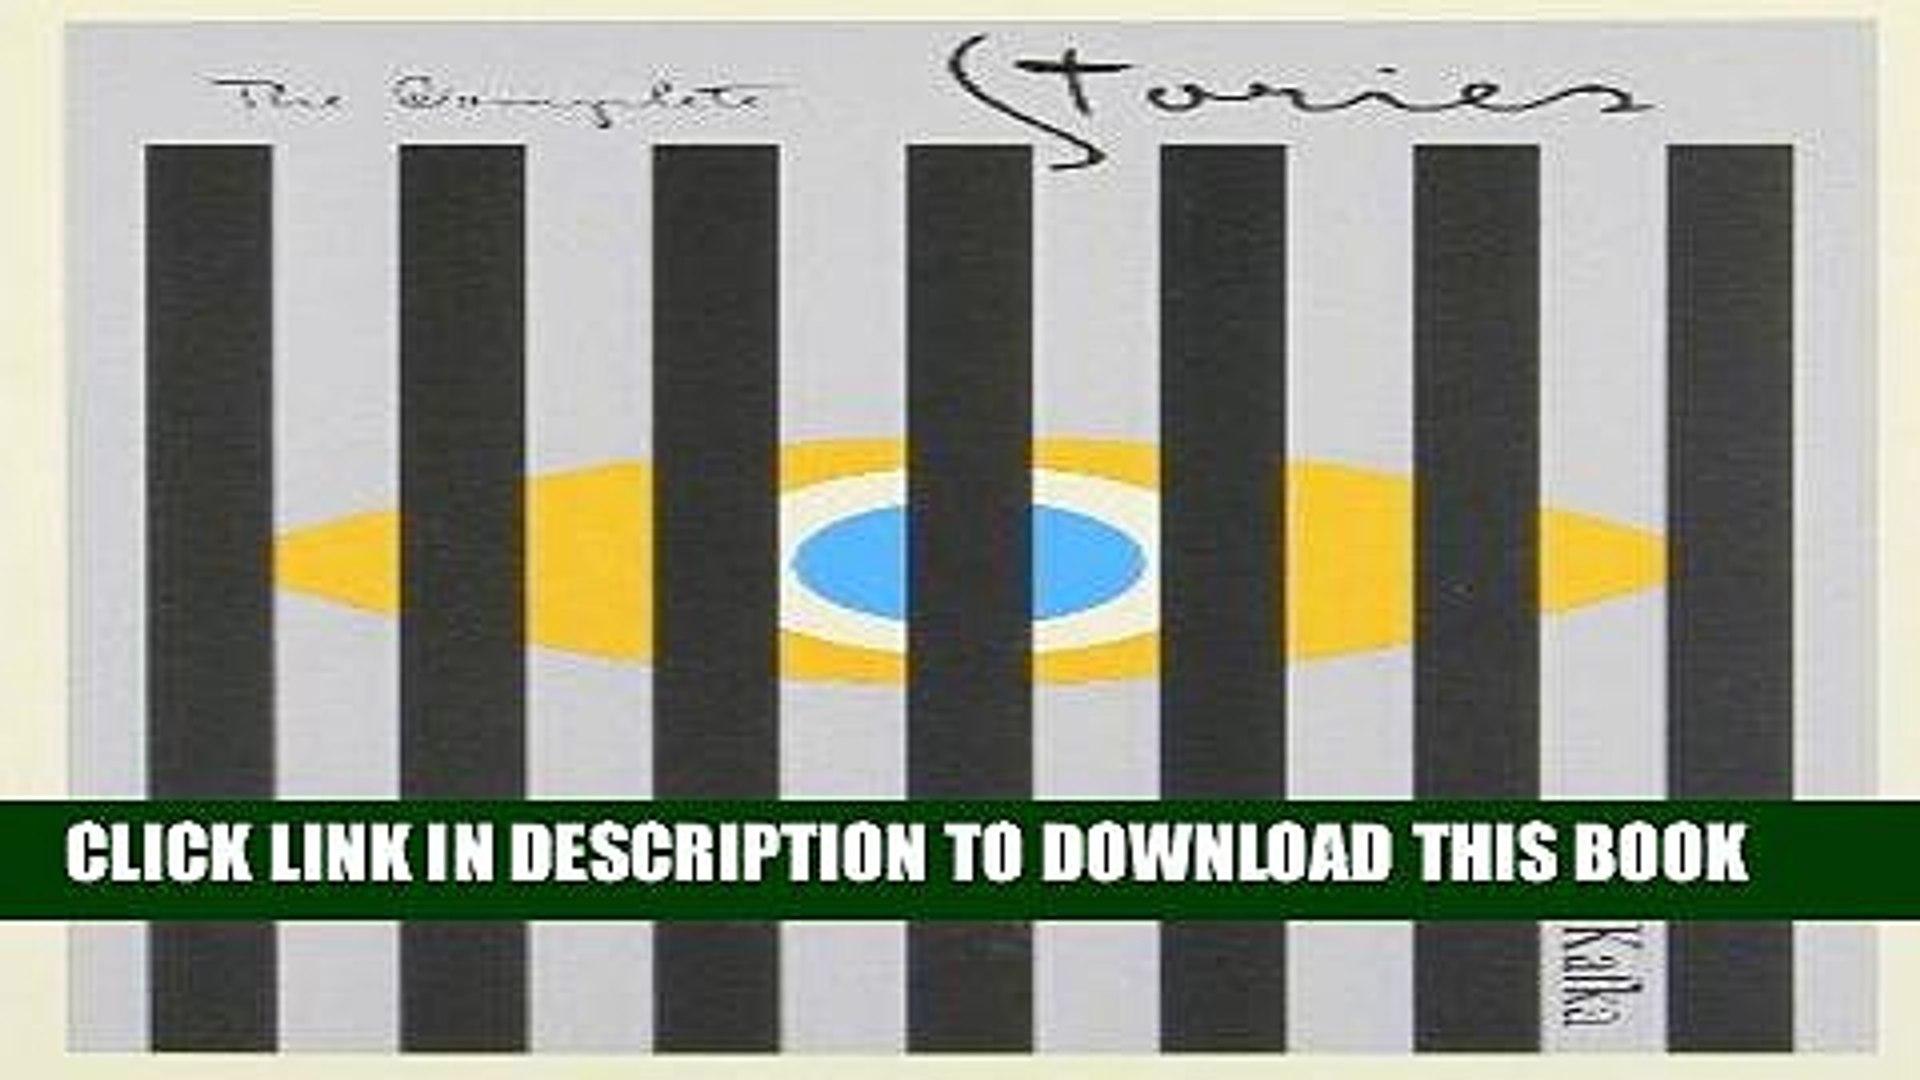 [PDF] FREE Franz Kafka: The Complete Stories [Download] Full Ebook[PDF] FREE Franz Kafka: The